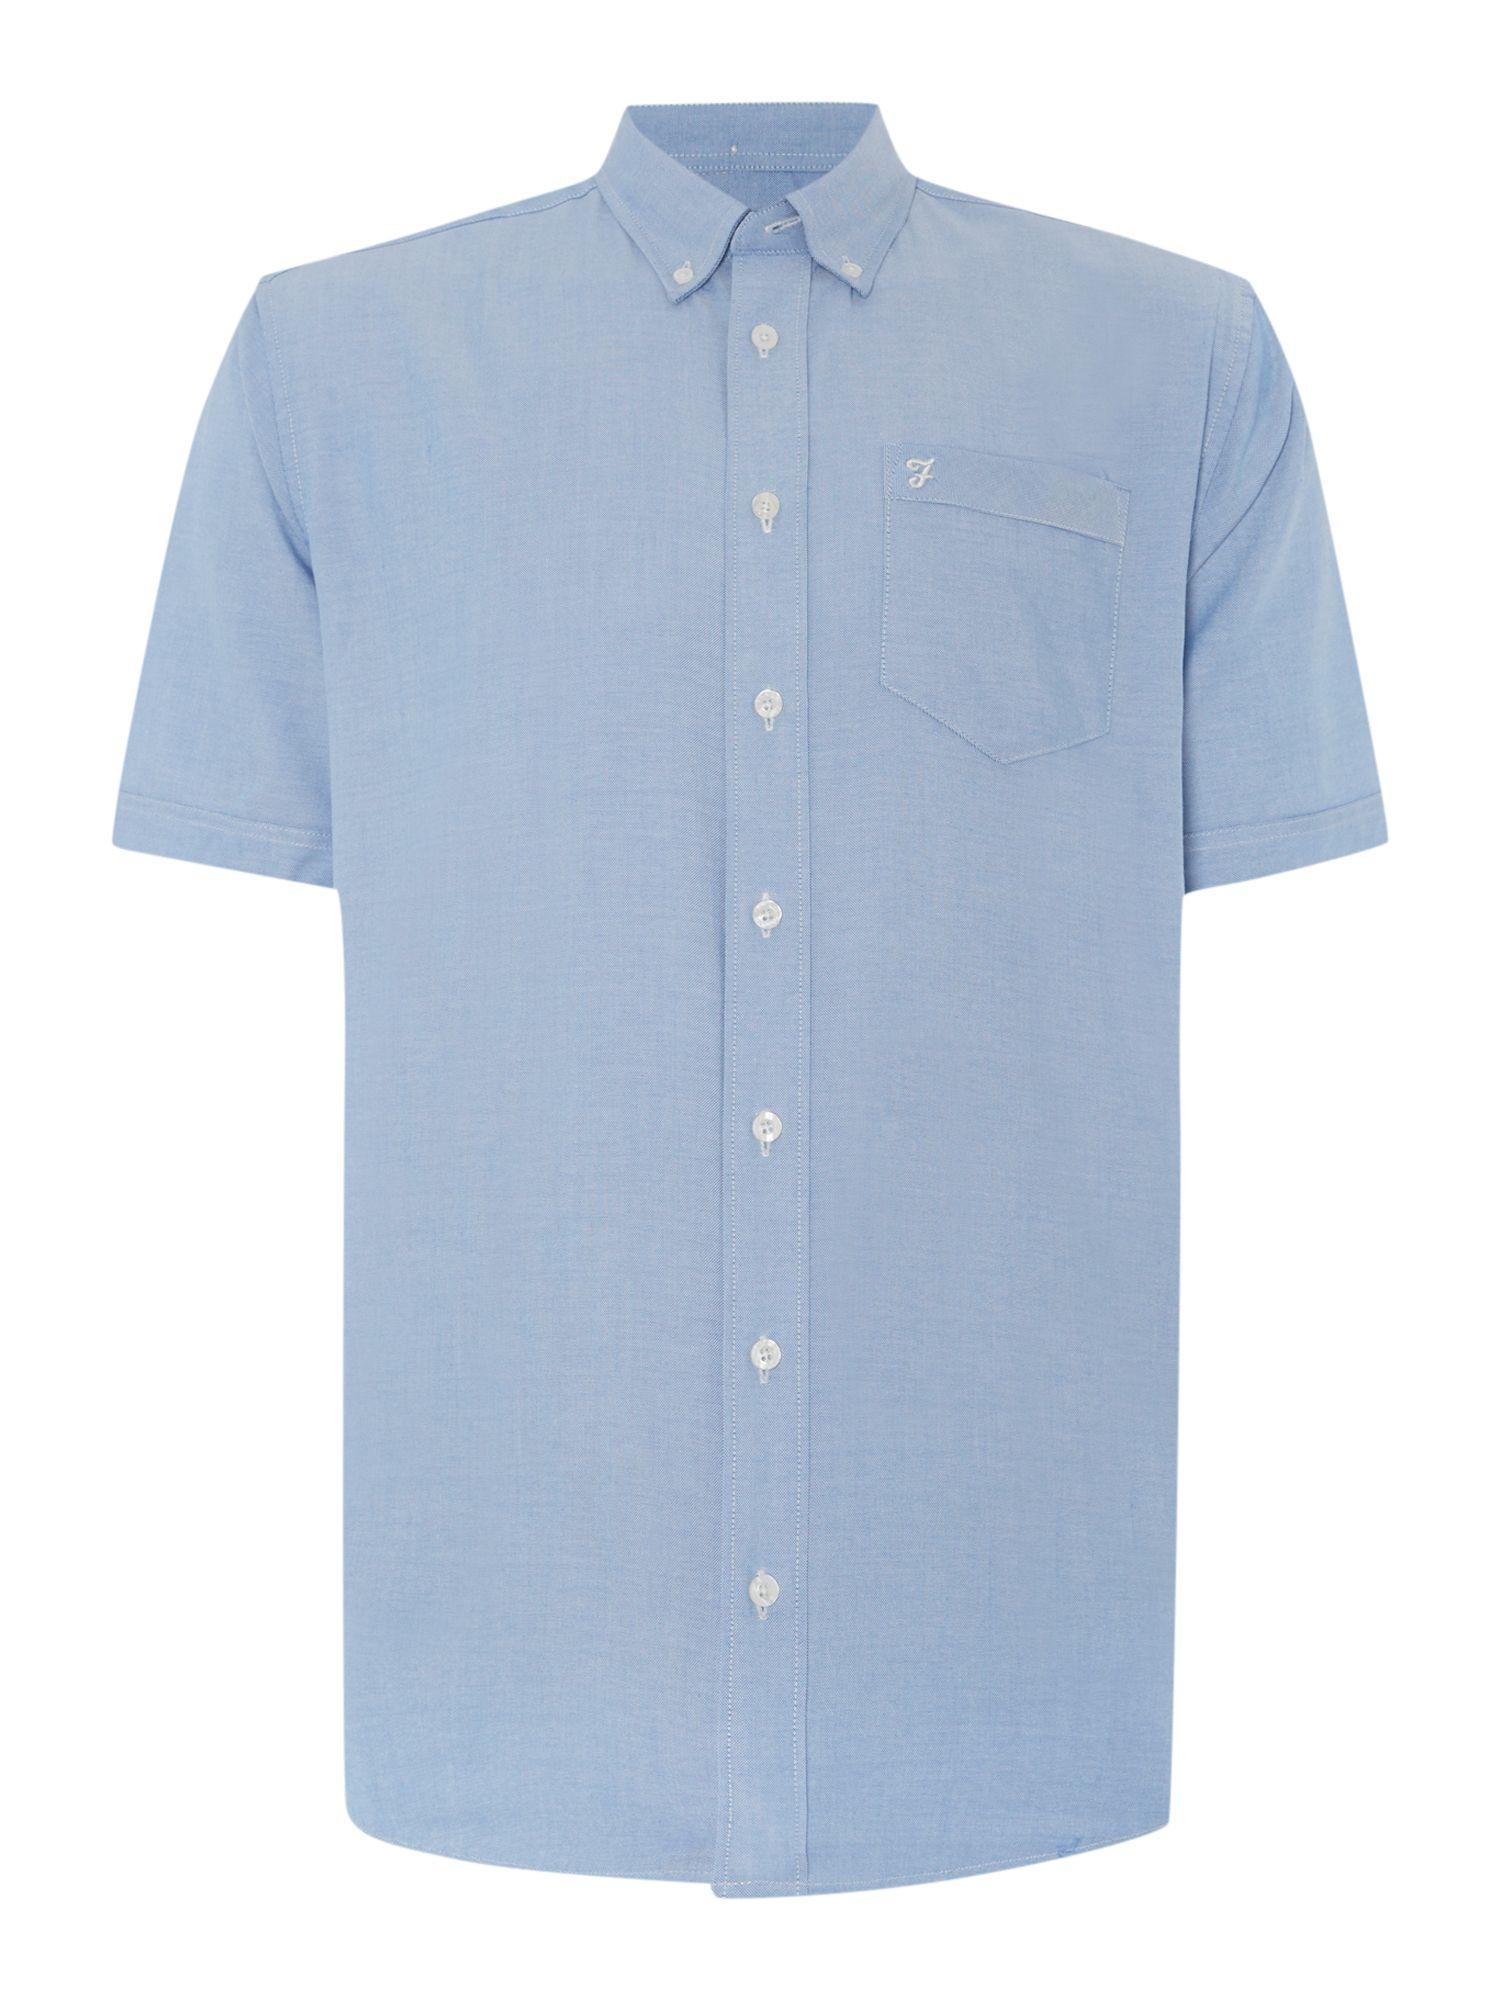 Farah plain classic fit short sleeve button down shirt in for Preppy button down shirts